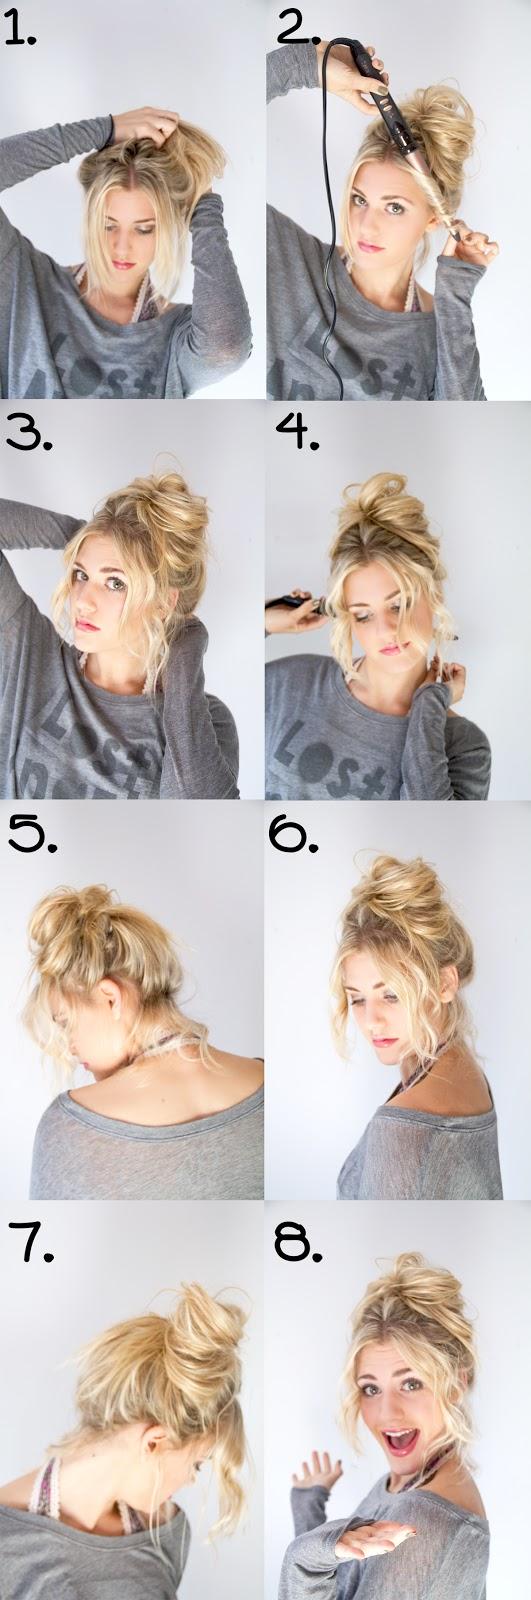 hair tutorial, messy bun, fun, hairstyle, blonde